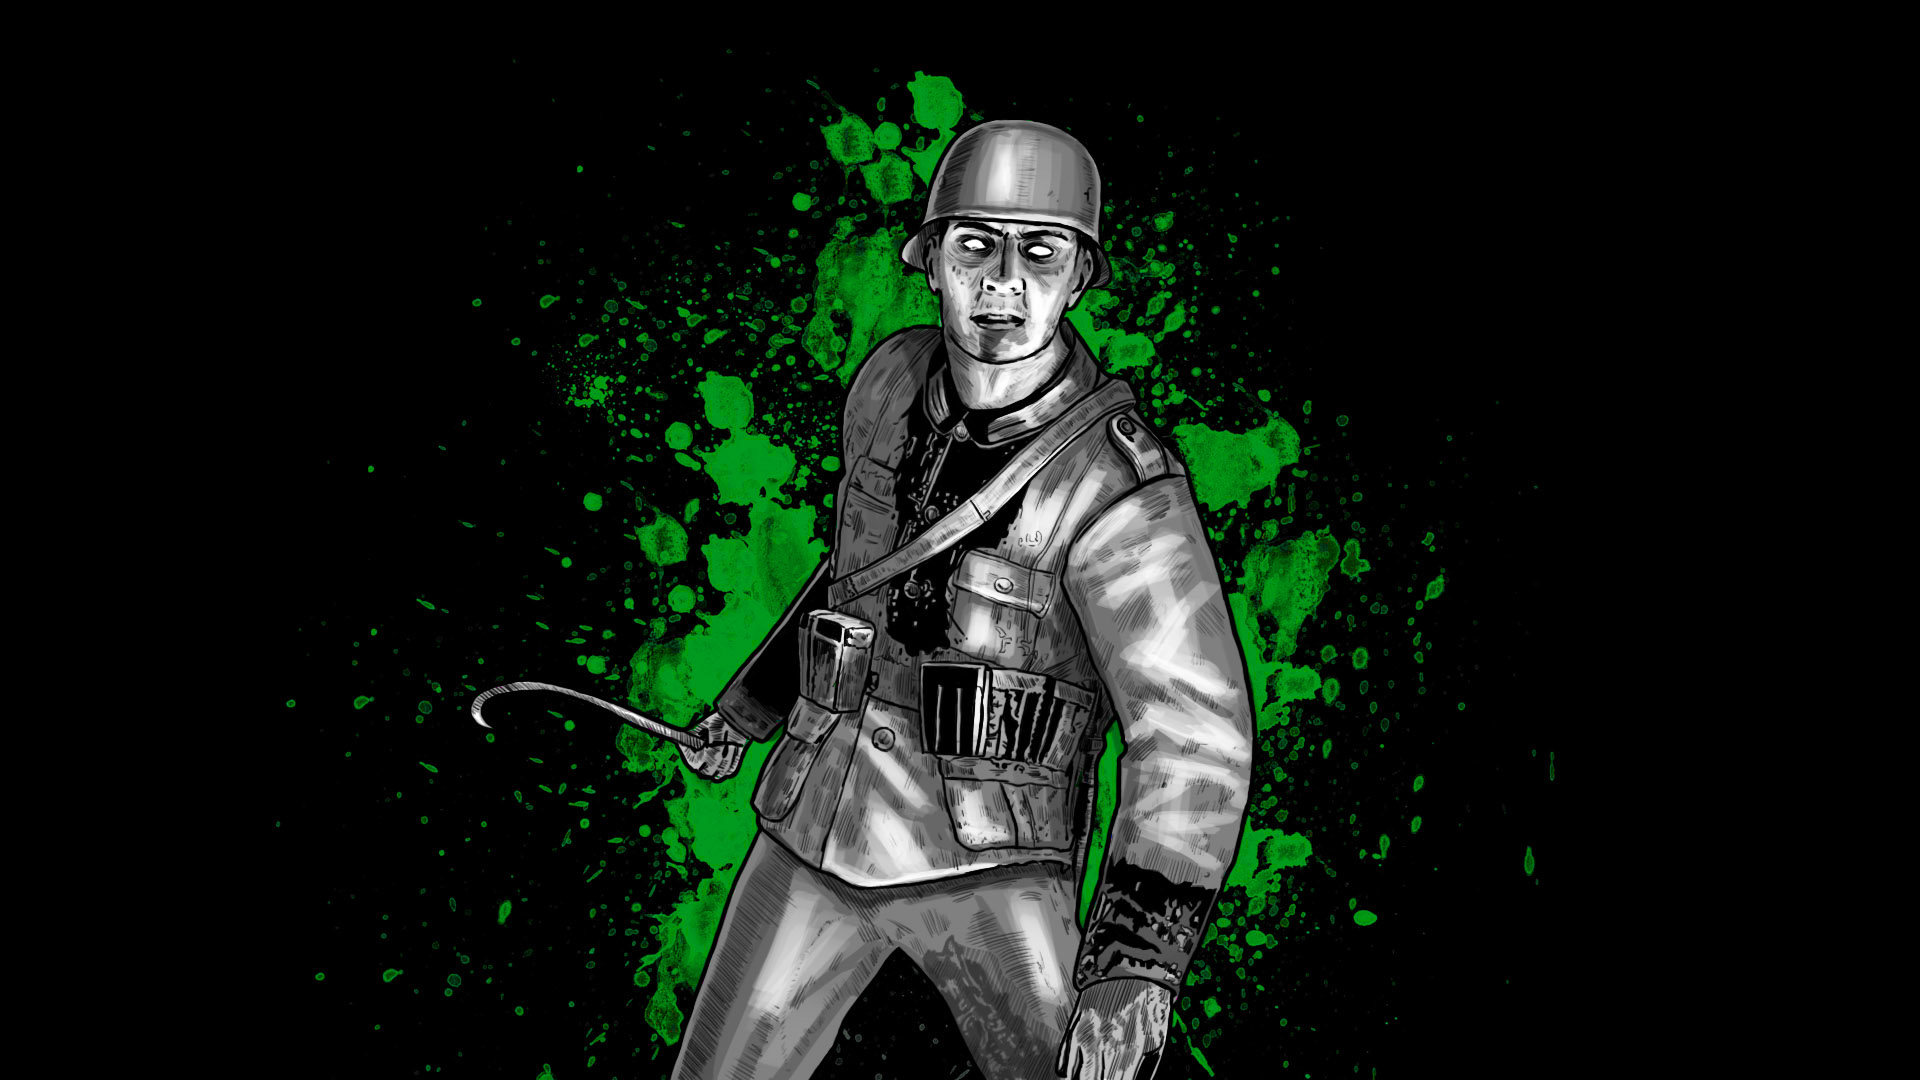 Sniper Elite Nazi Zombie Army Artwork 8.jpg